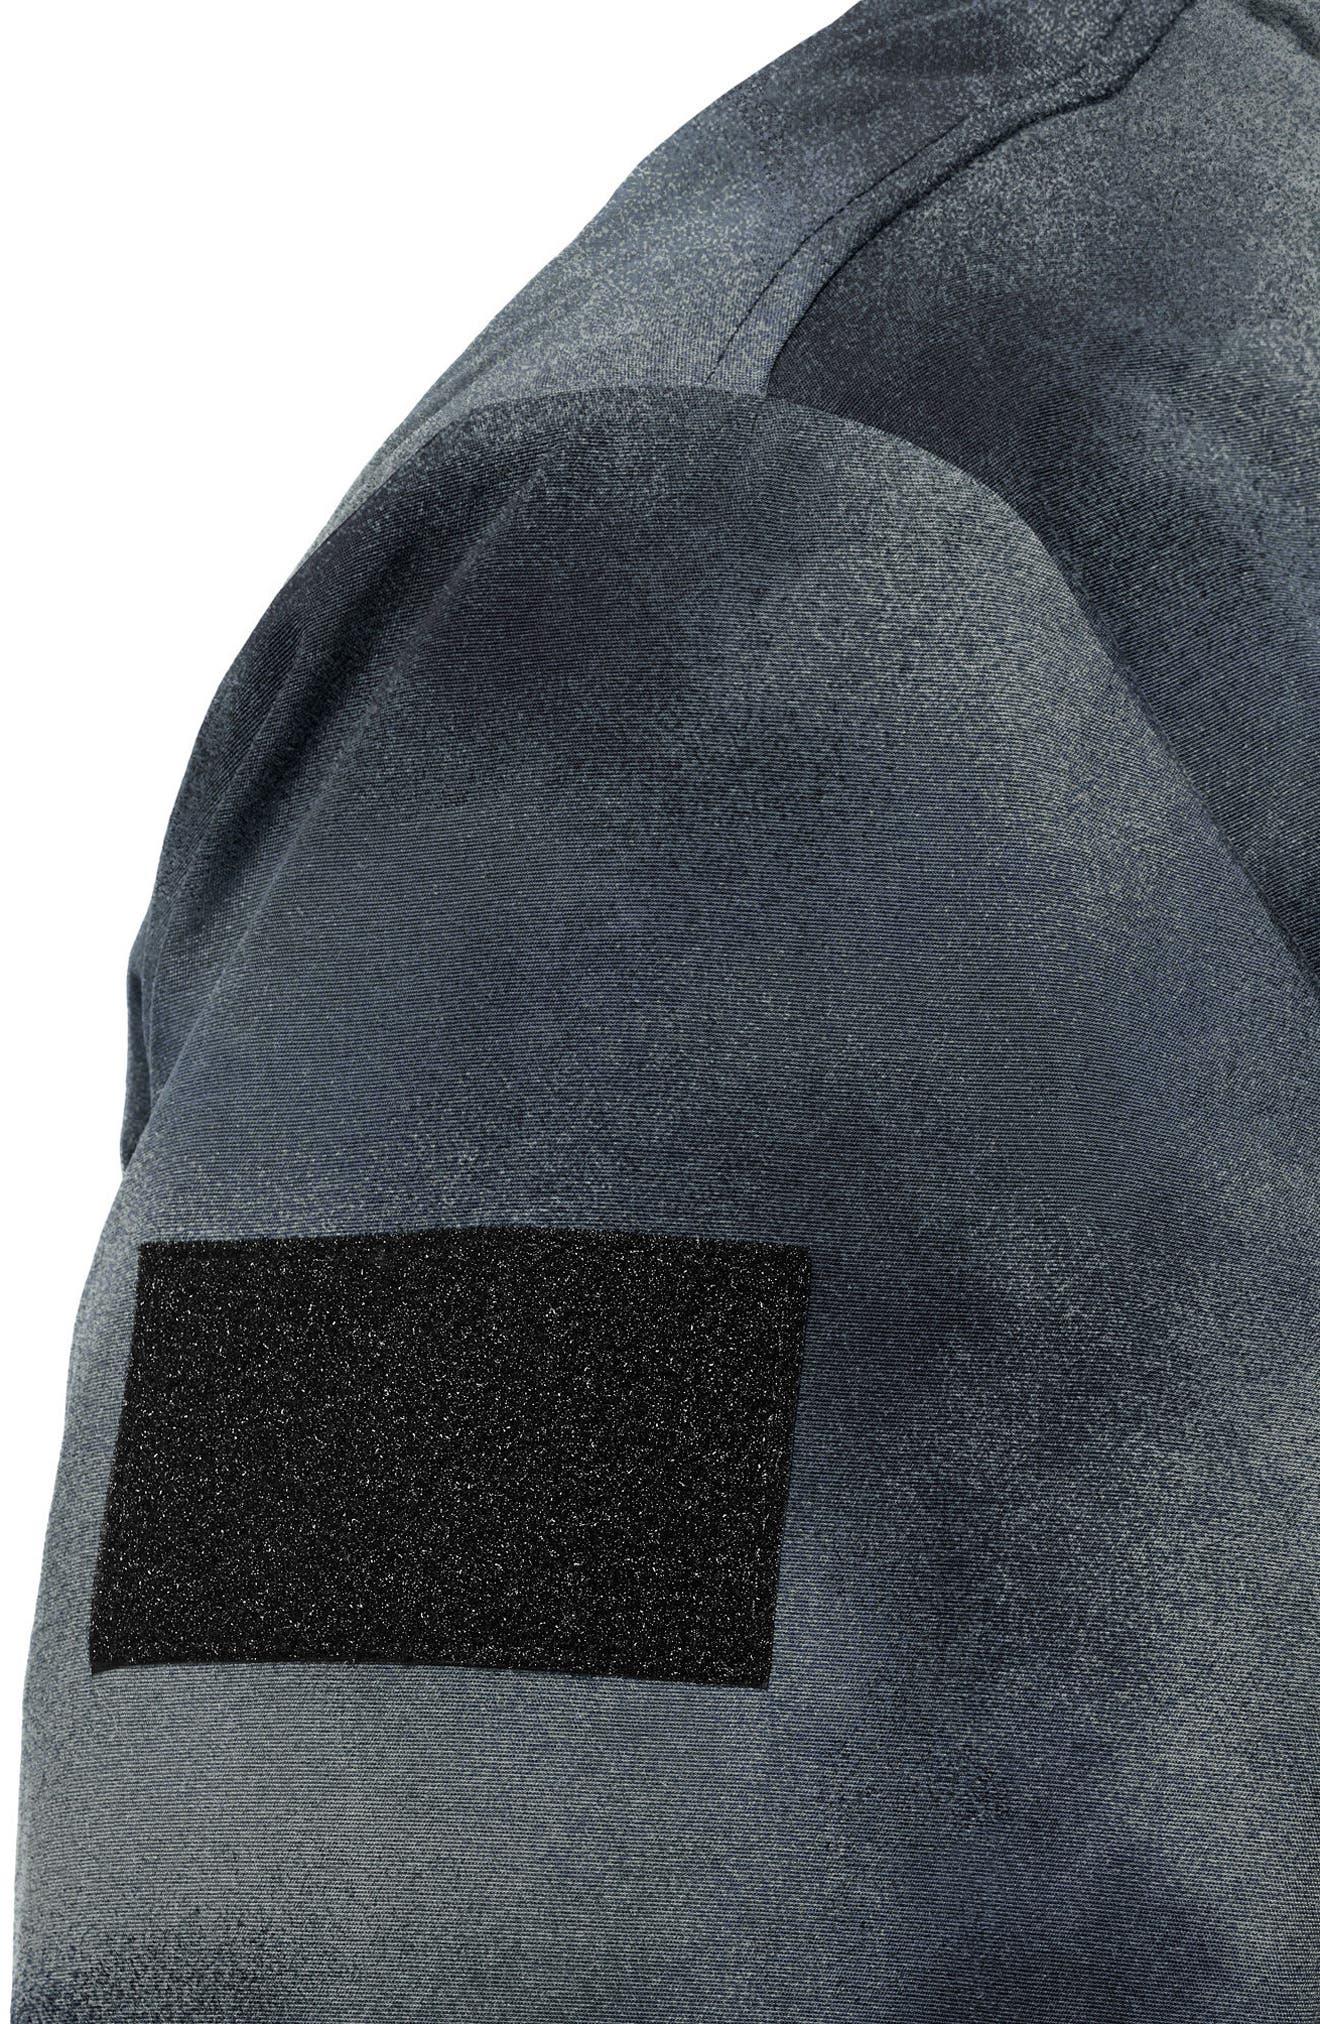 Voyager Jacket,                             Alternate thumbnail 5, color,                             Sandstorm Camo Navy